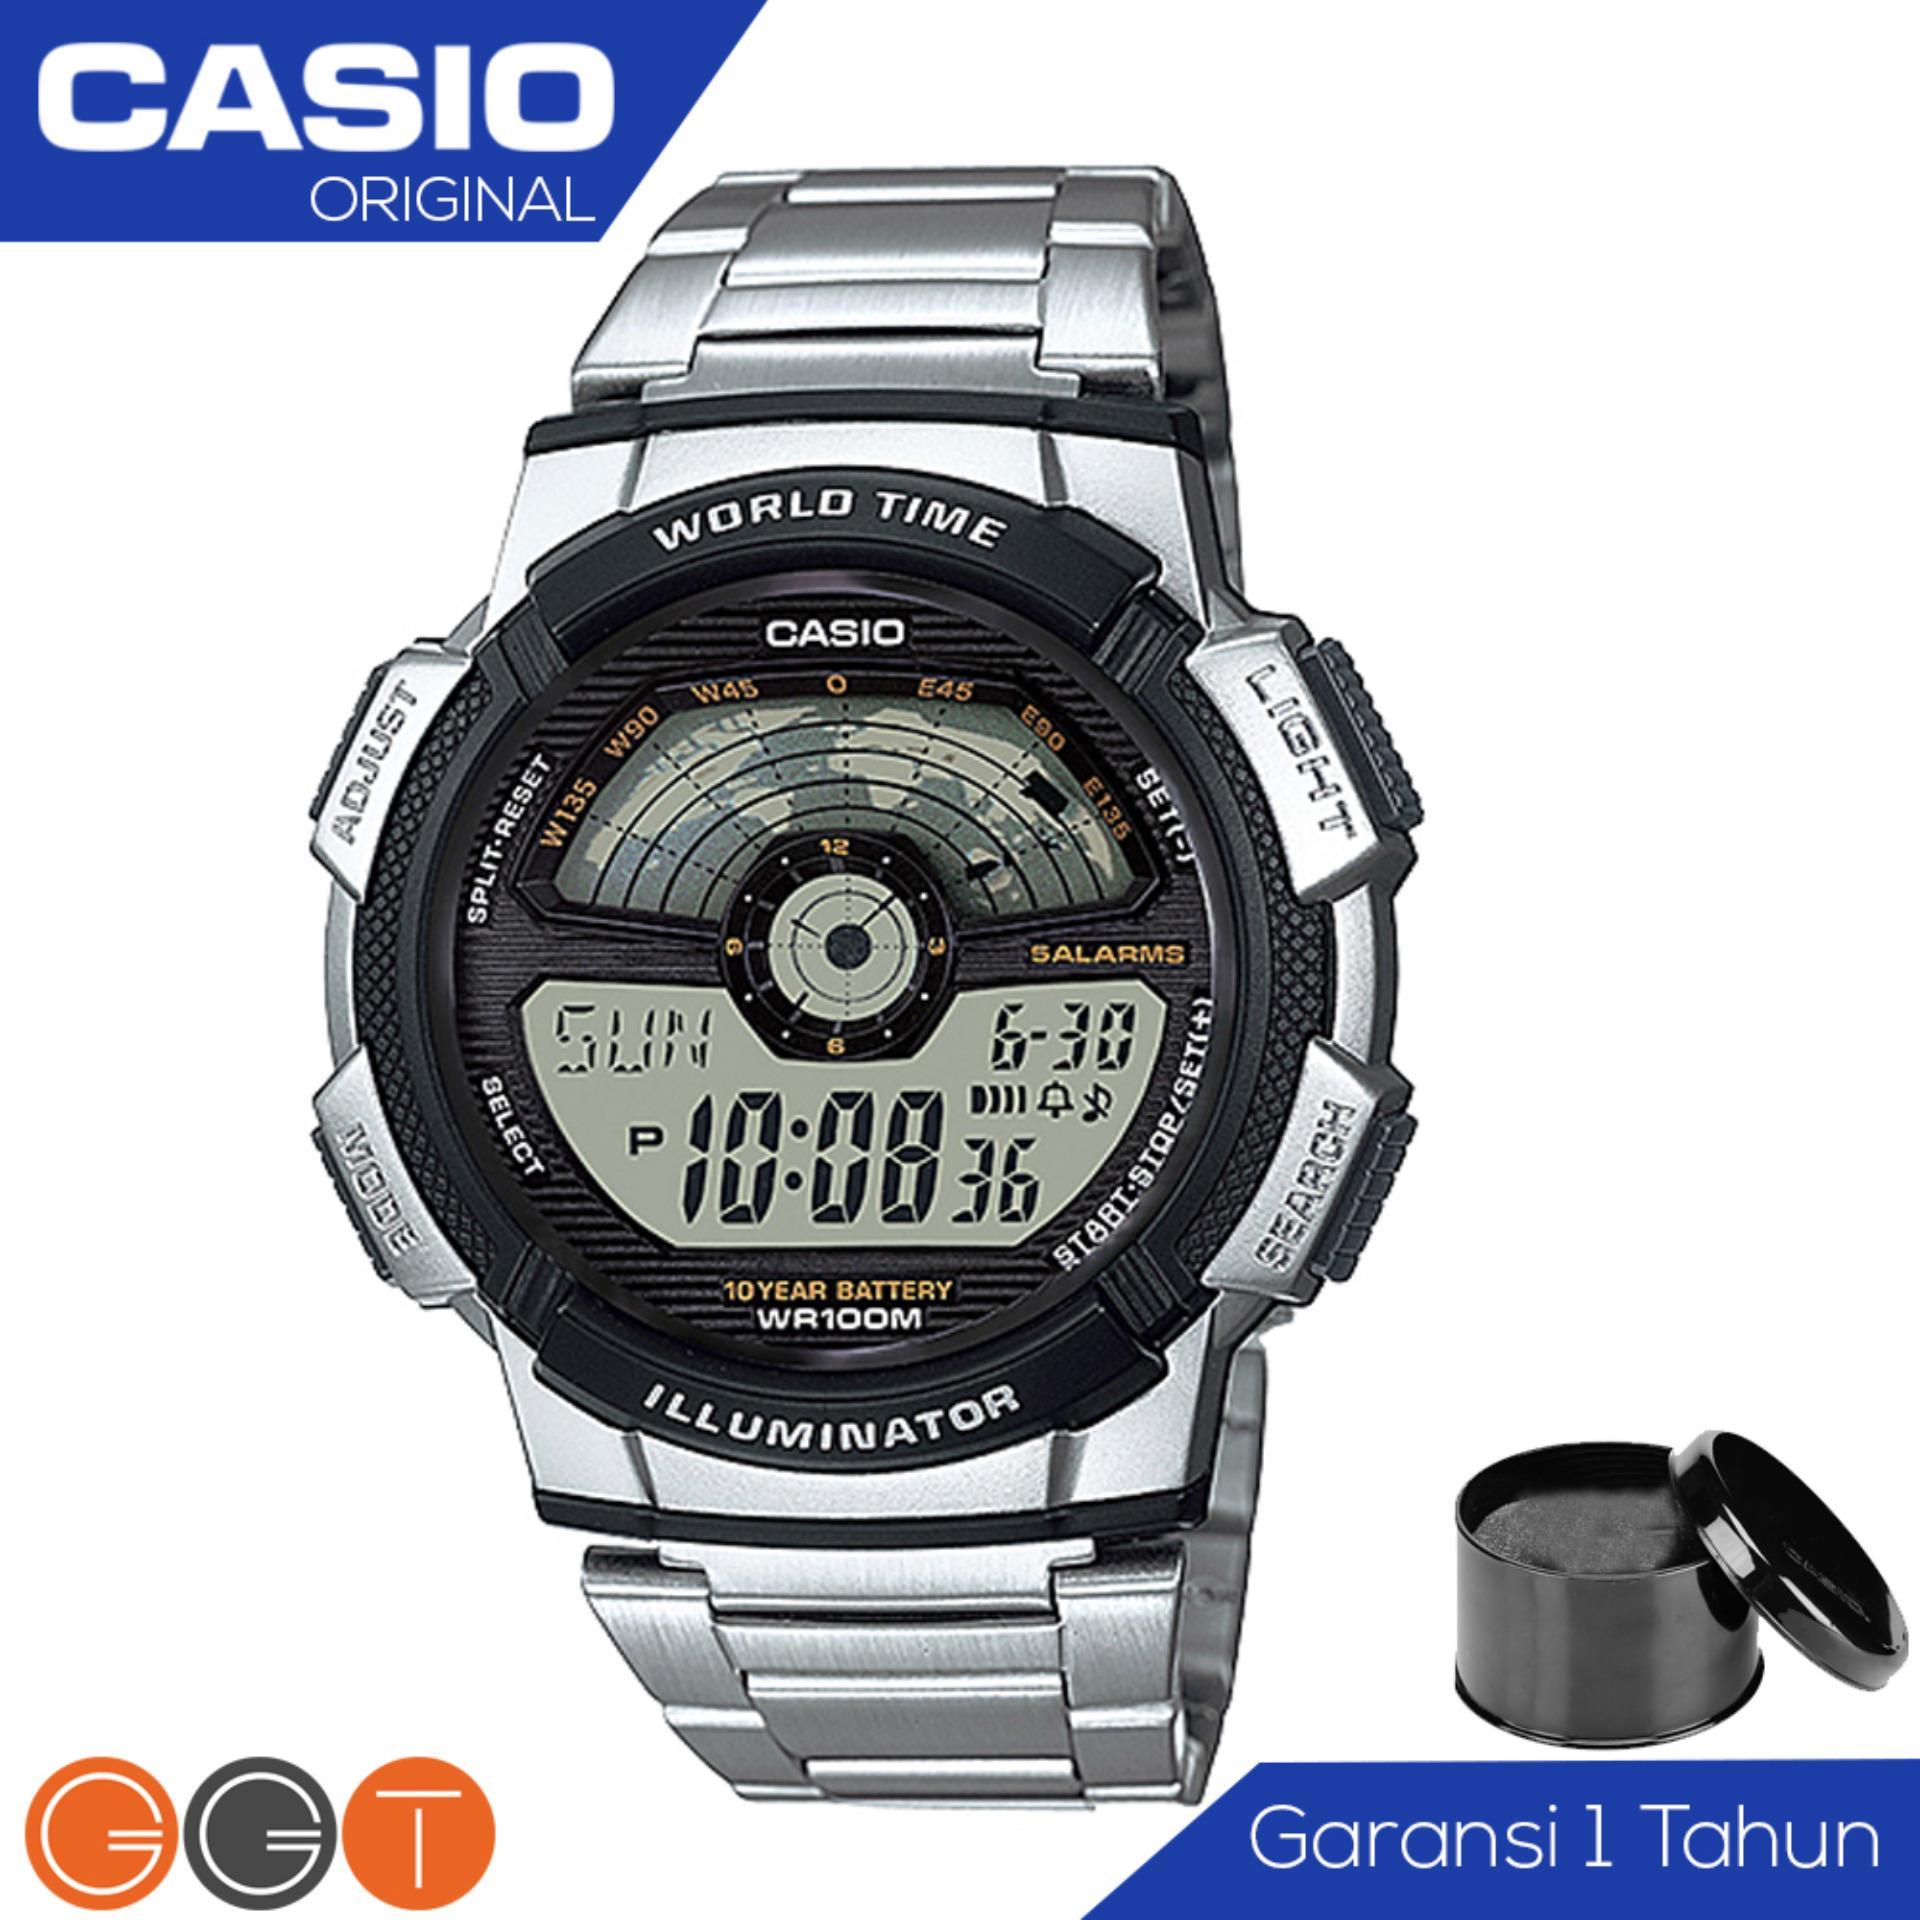 CASIO Illuminator AE-1100WD-1AVDF - Jam Tangan Pria - Tali Logam Stainless Stell - Digital Movement - Silver Hitam